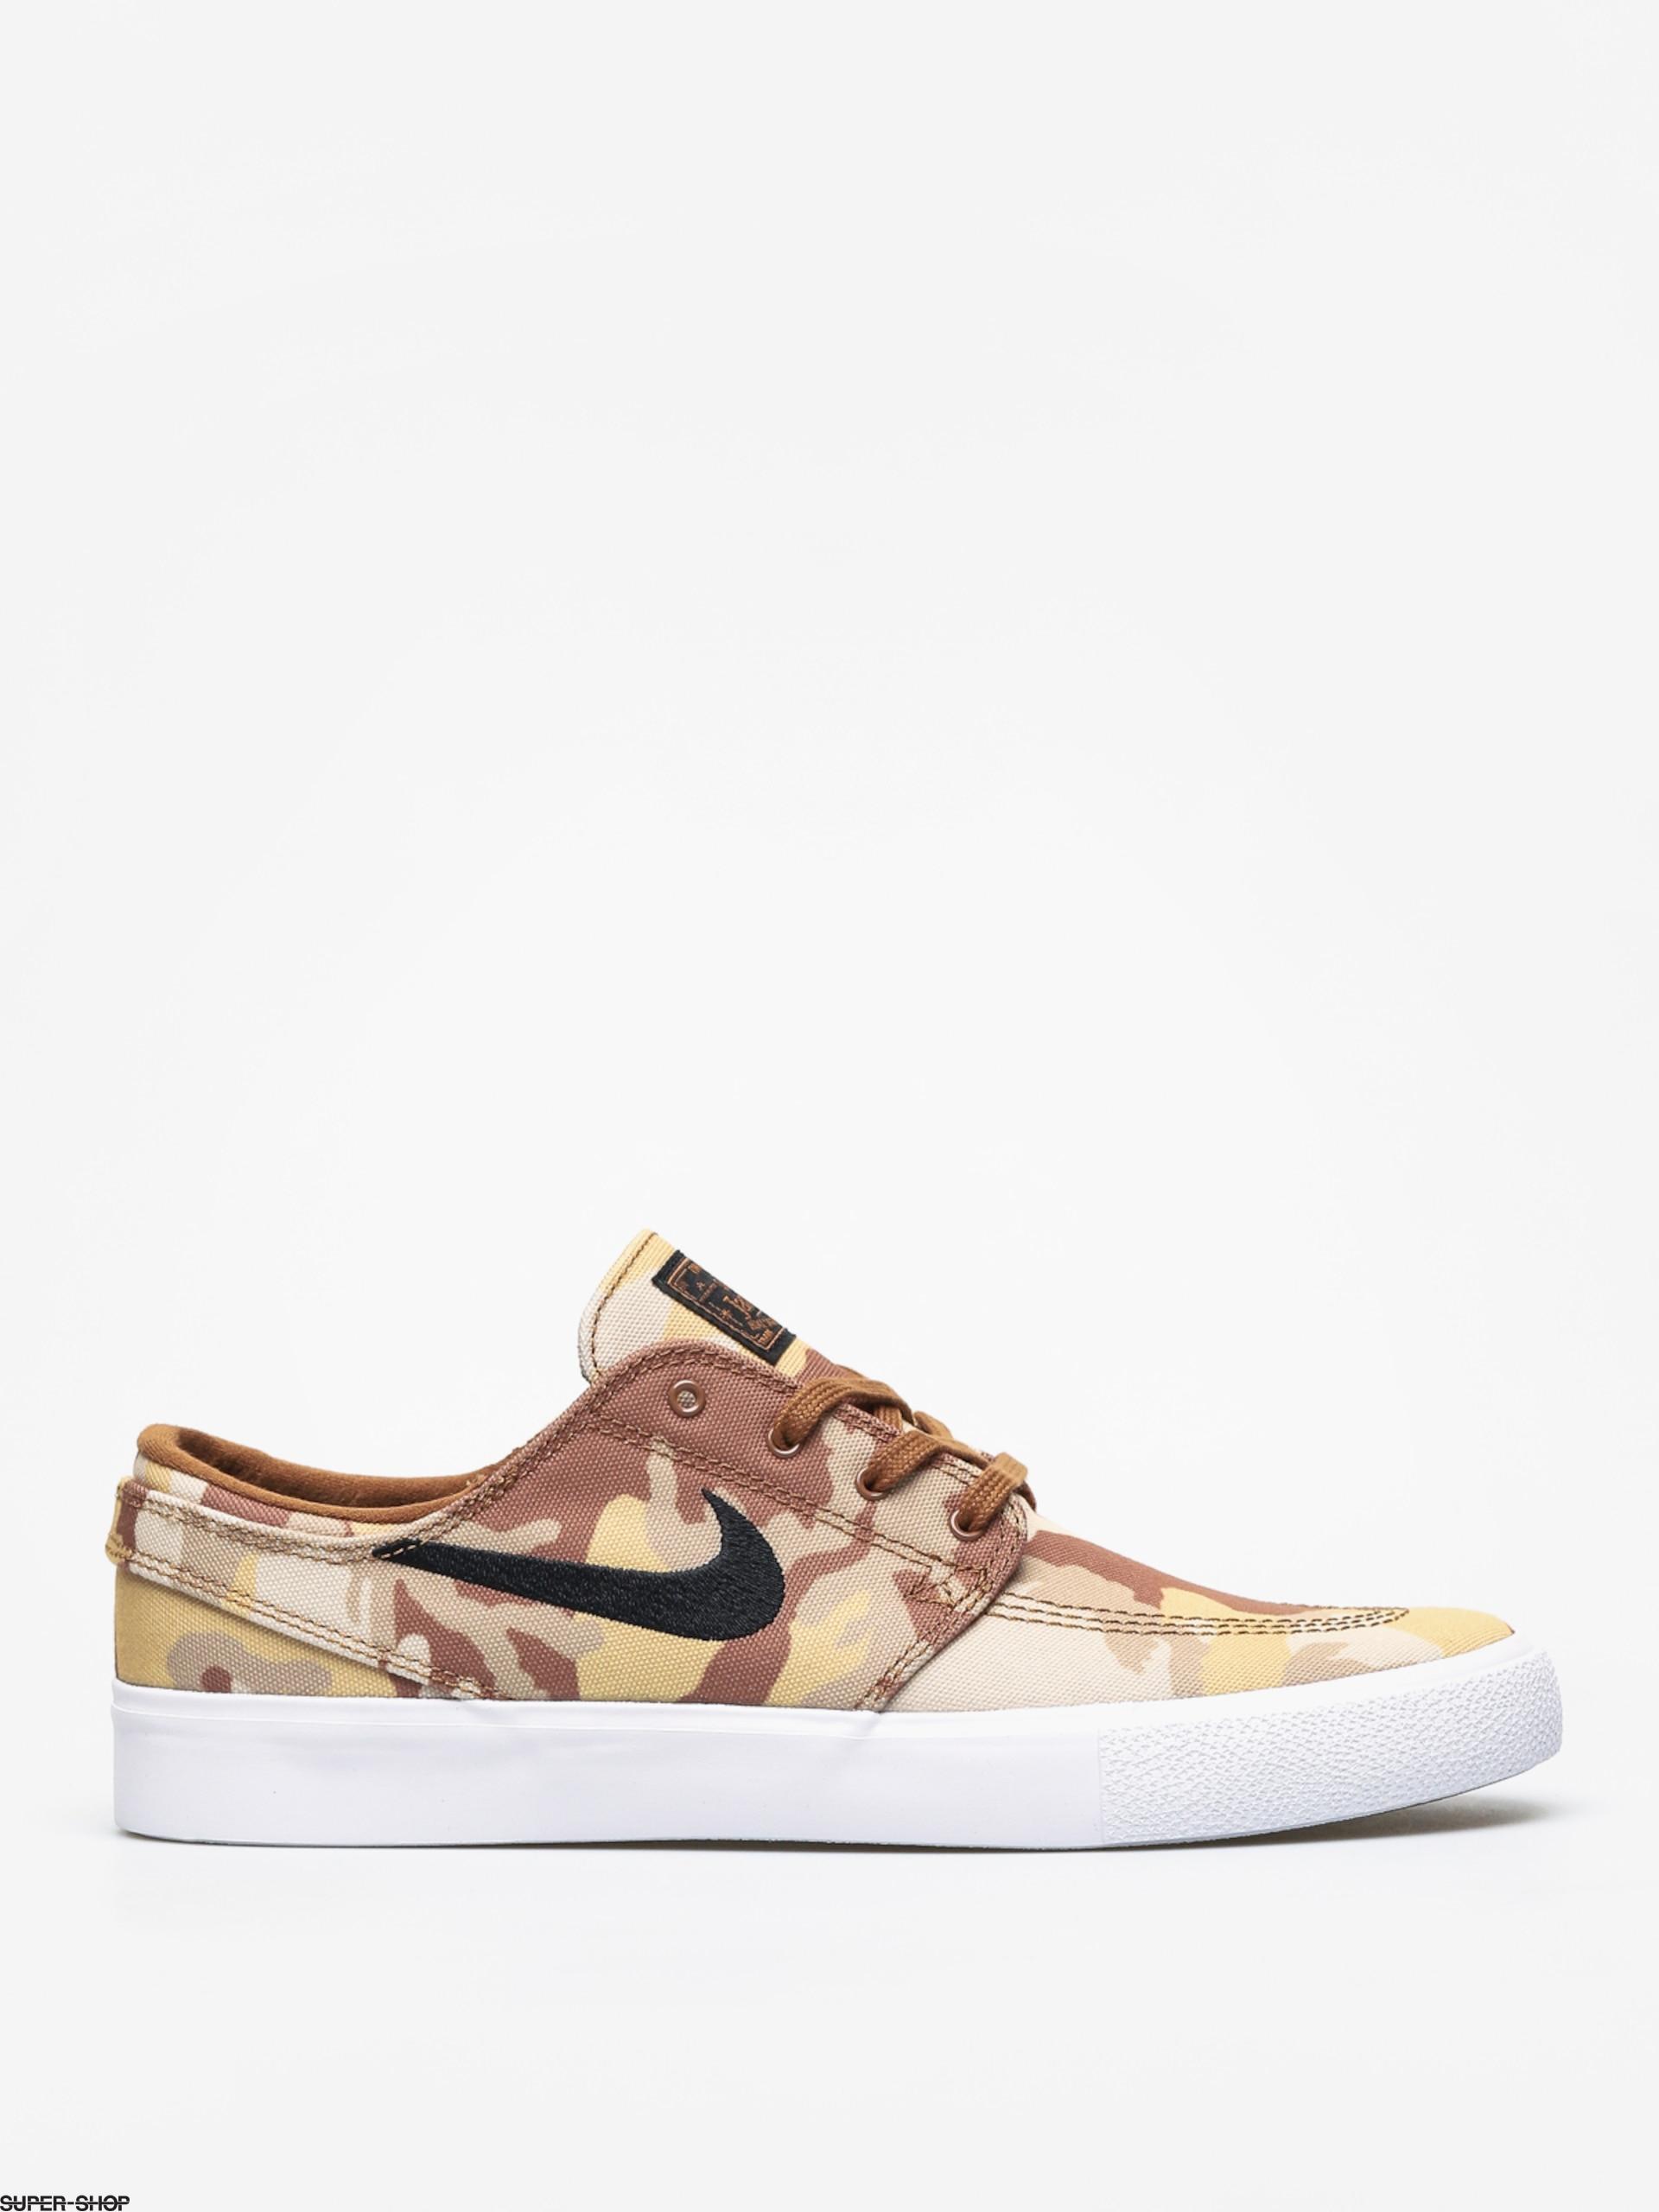 newest 5ea0e 6a953 Nike SB Zoom Janoski Cnvs Rm Prm Shoes (parachute beige black ale brown  white)